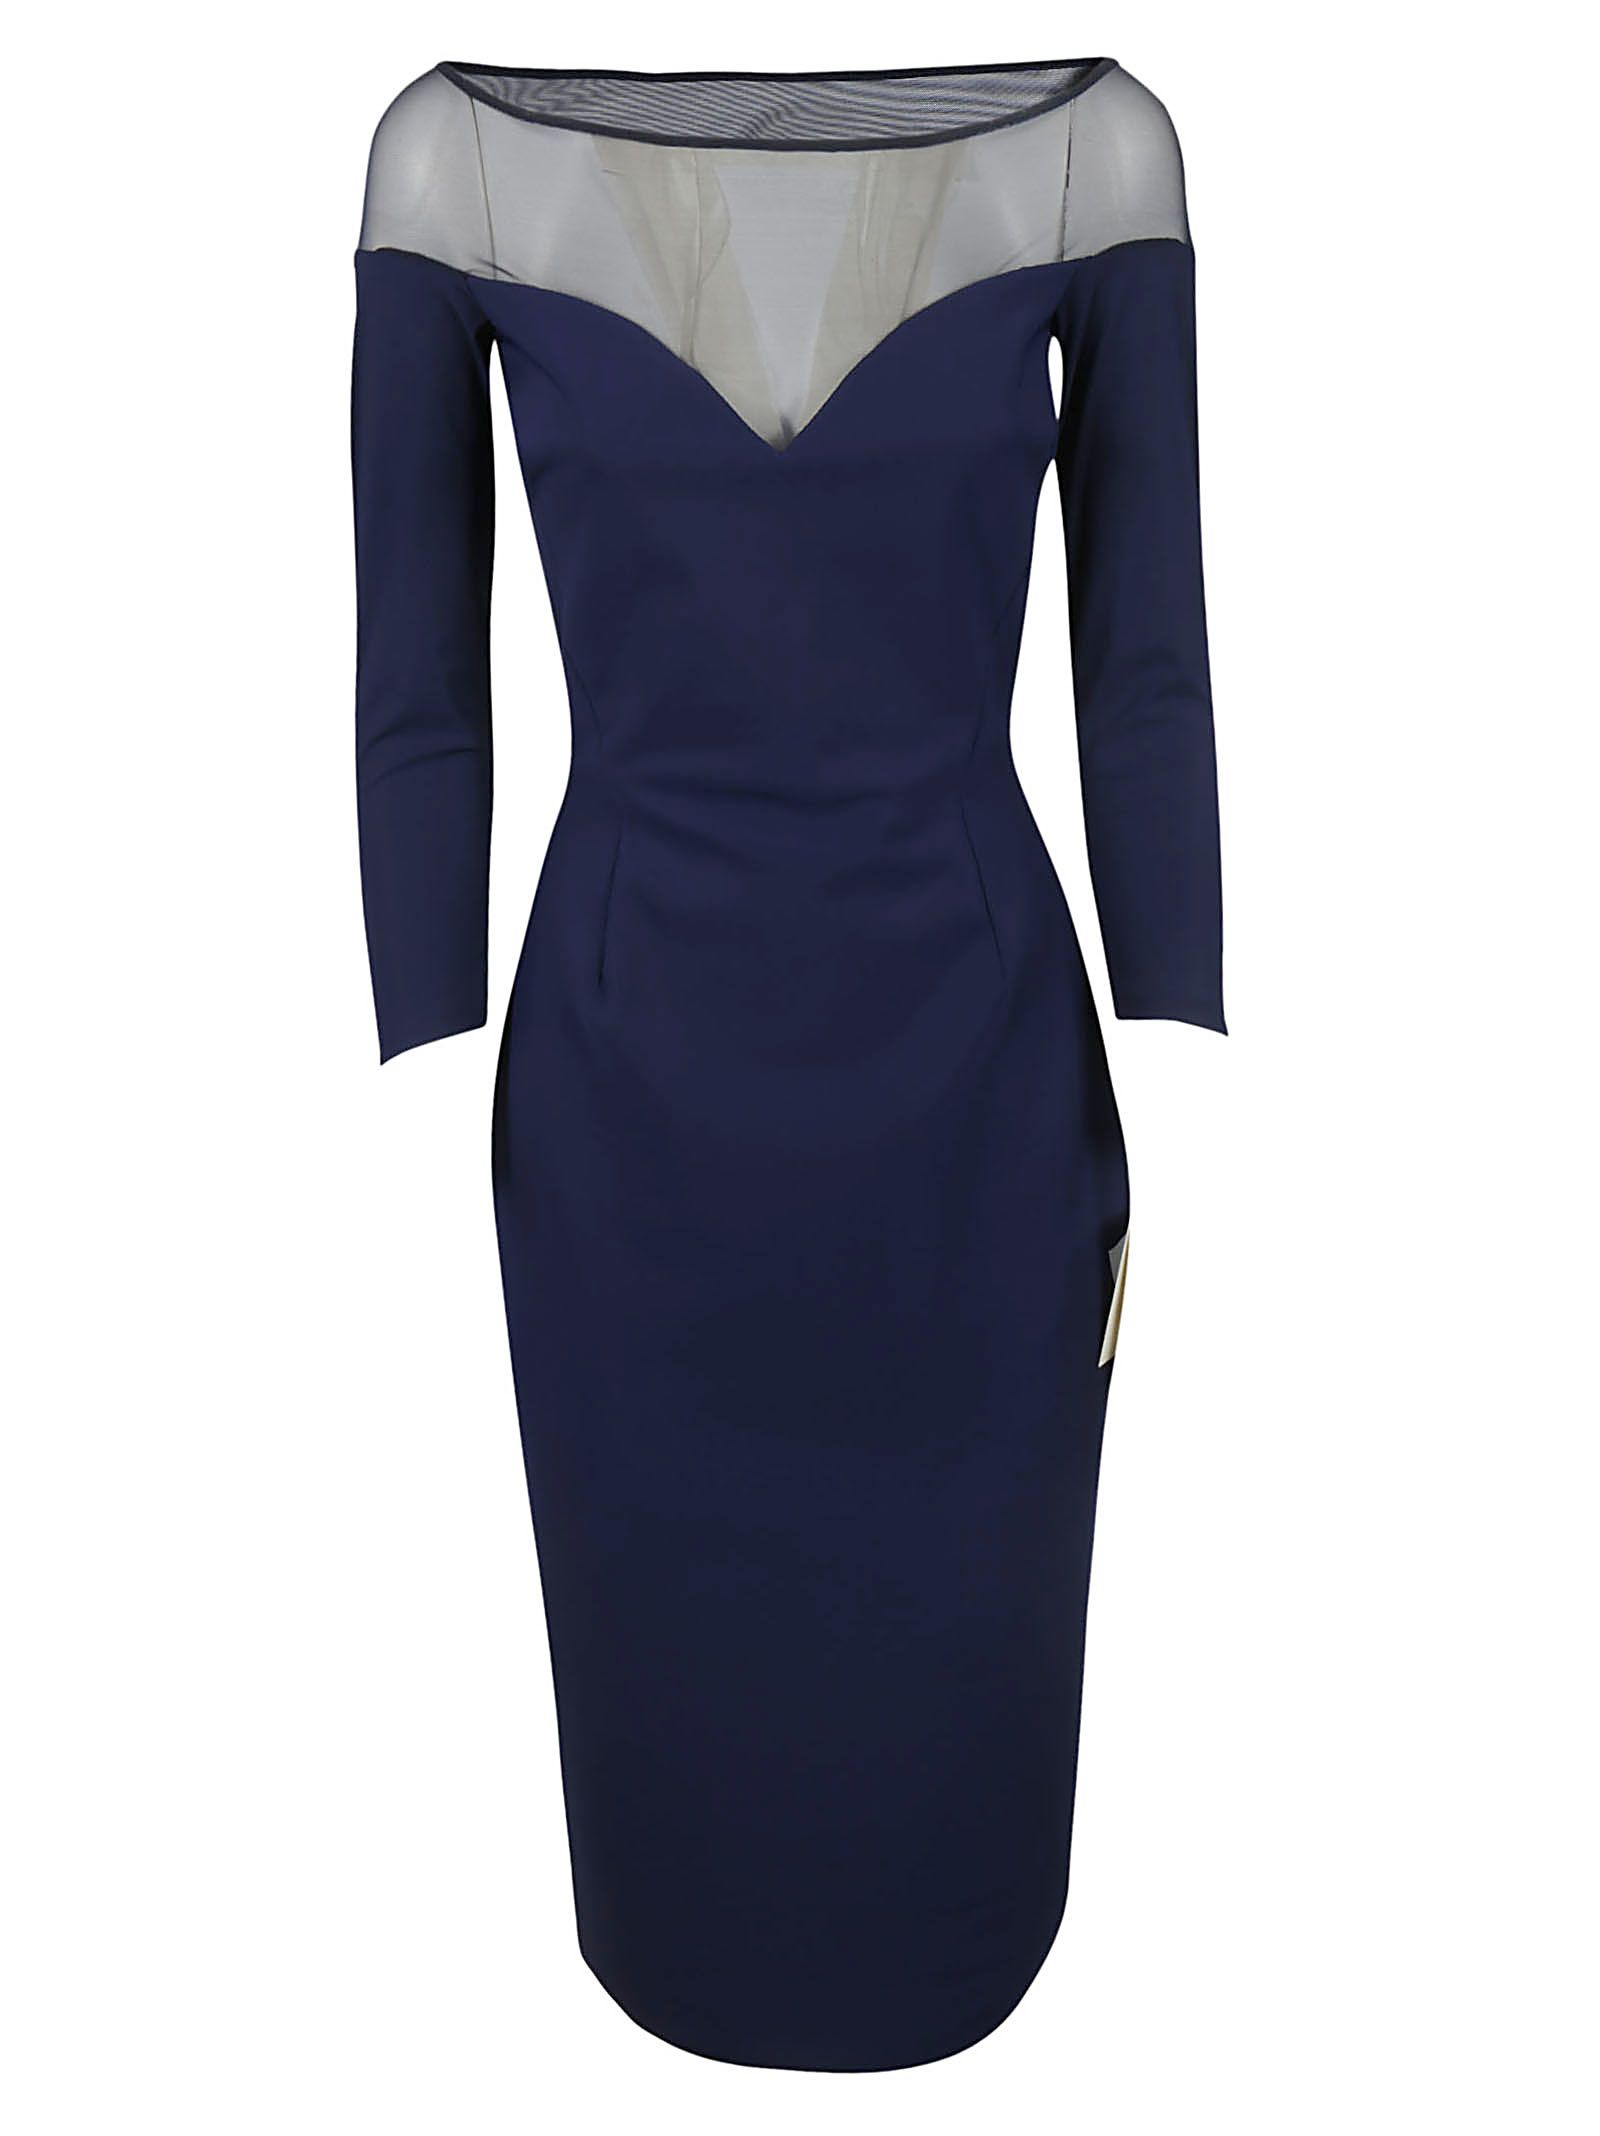 LA PETIT ROBE DI CHIARA BONI Viorika Dress in Dusk Blue